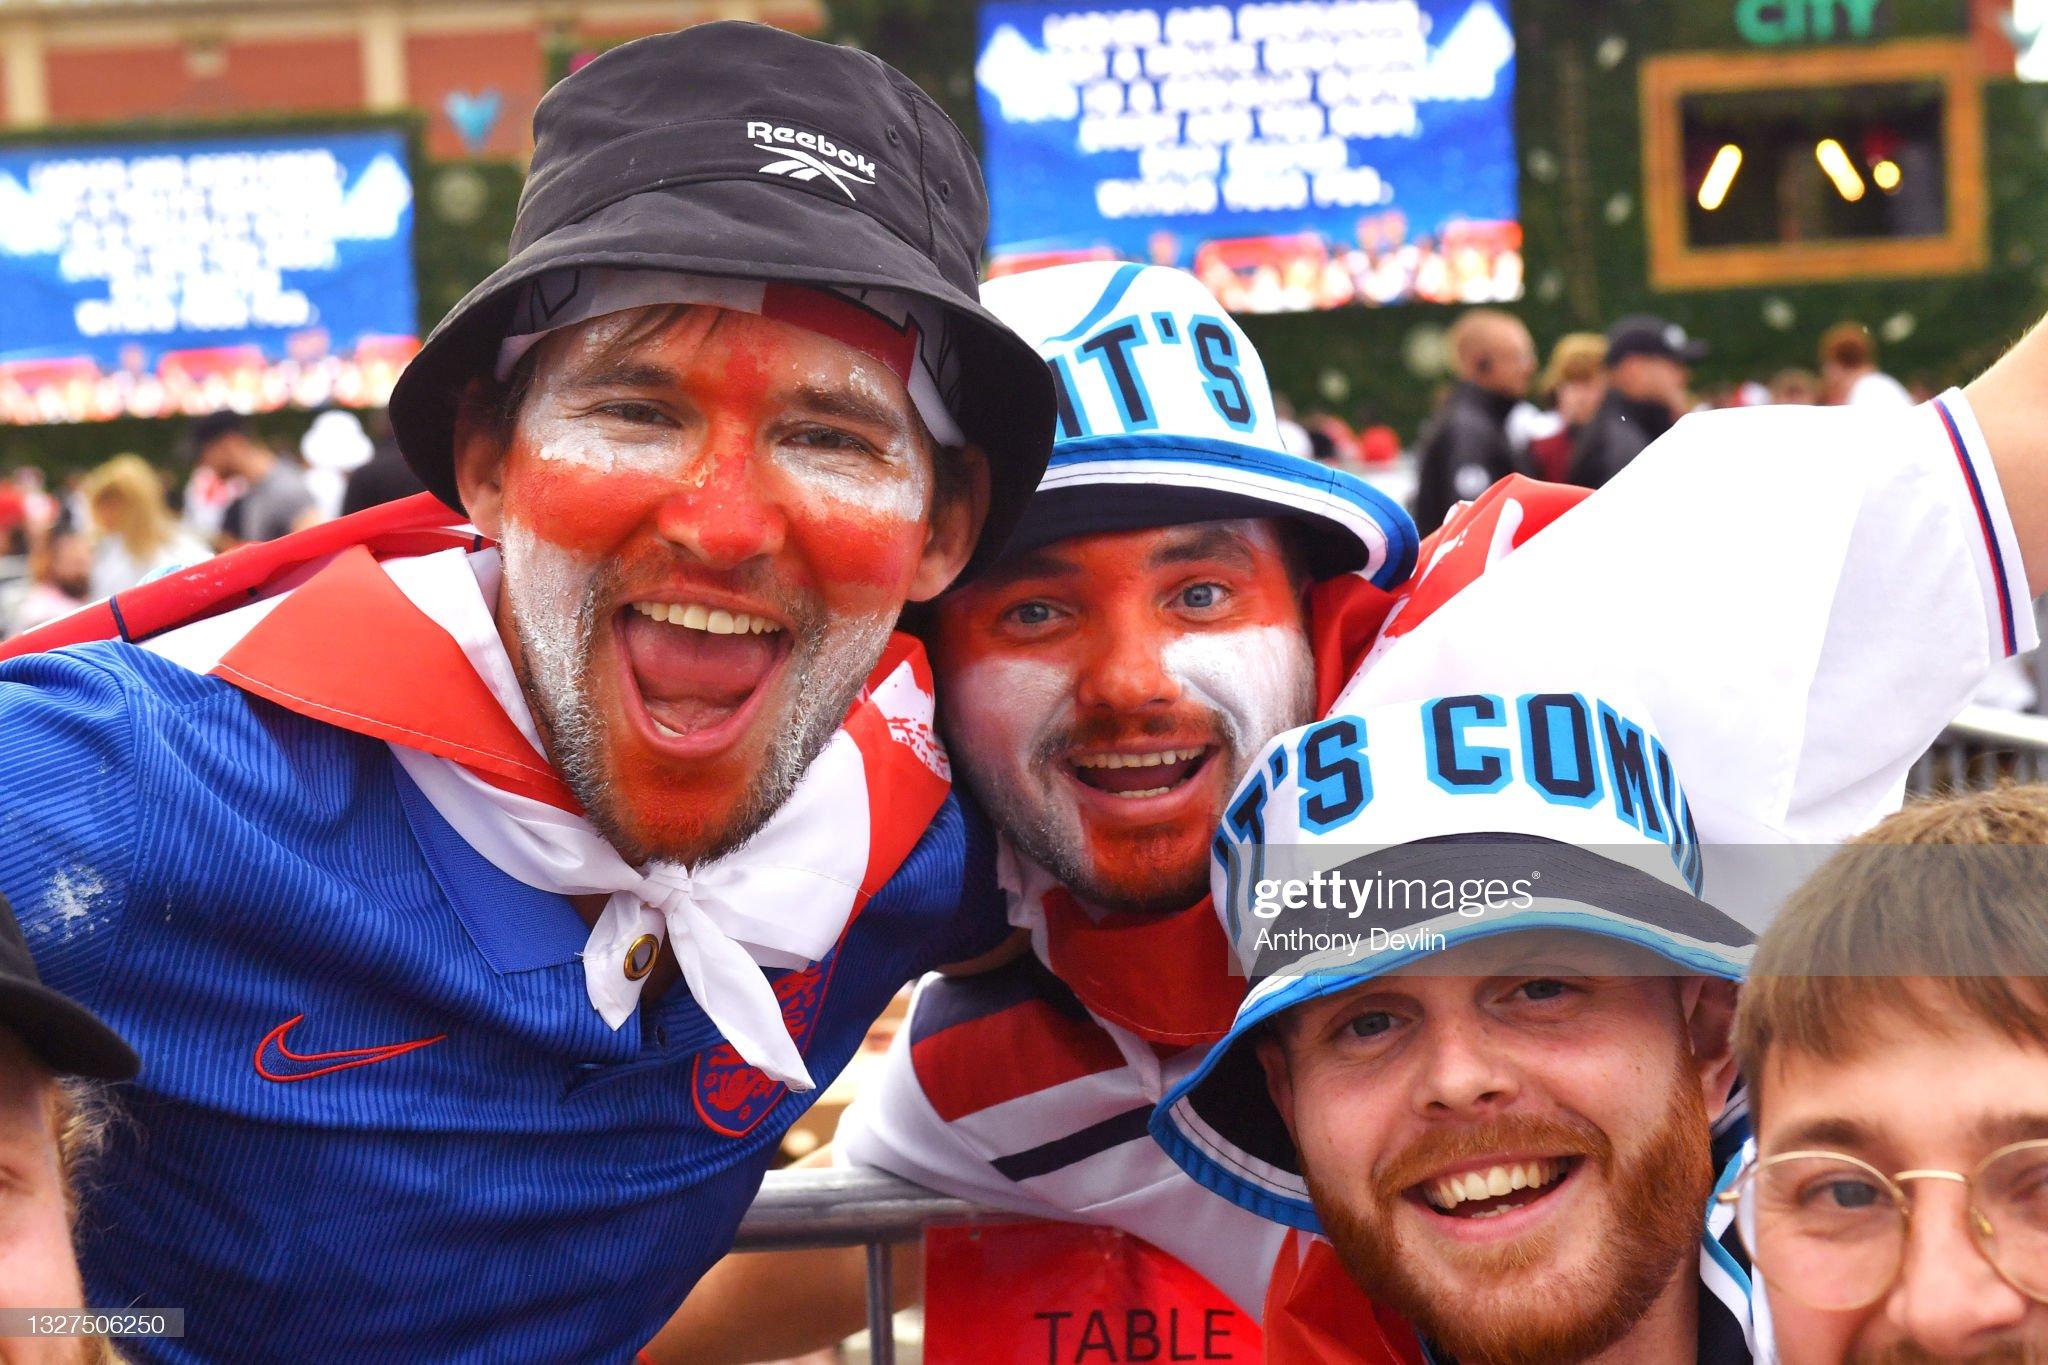 England Play Denmark In The Euro 2020 Semi Final : News Photo